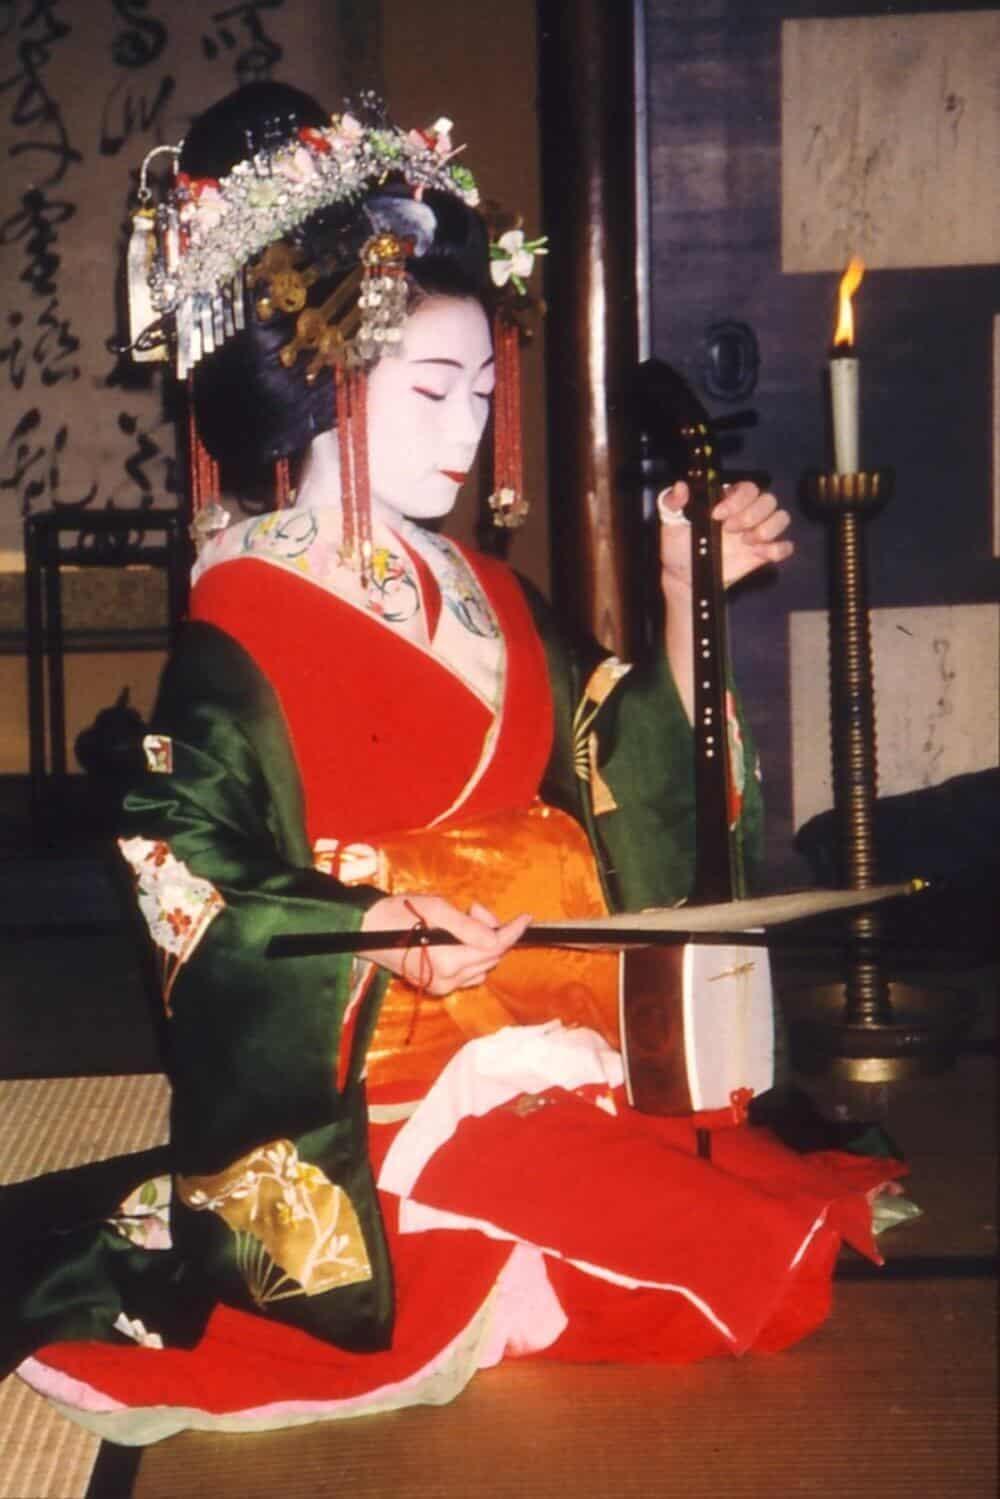 A flamboyantly dressed courtesan